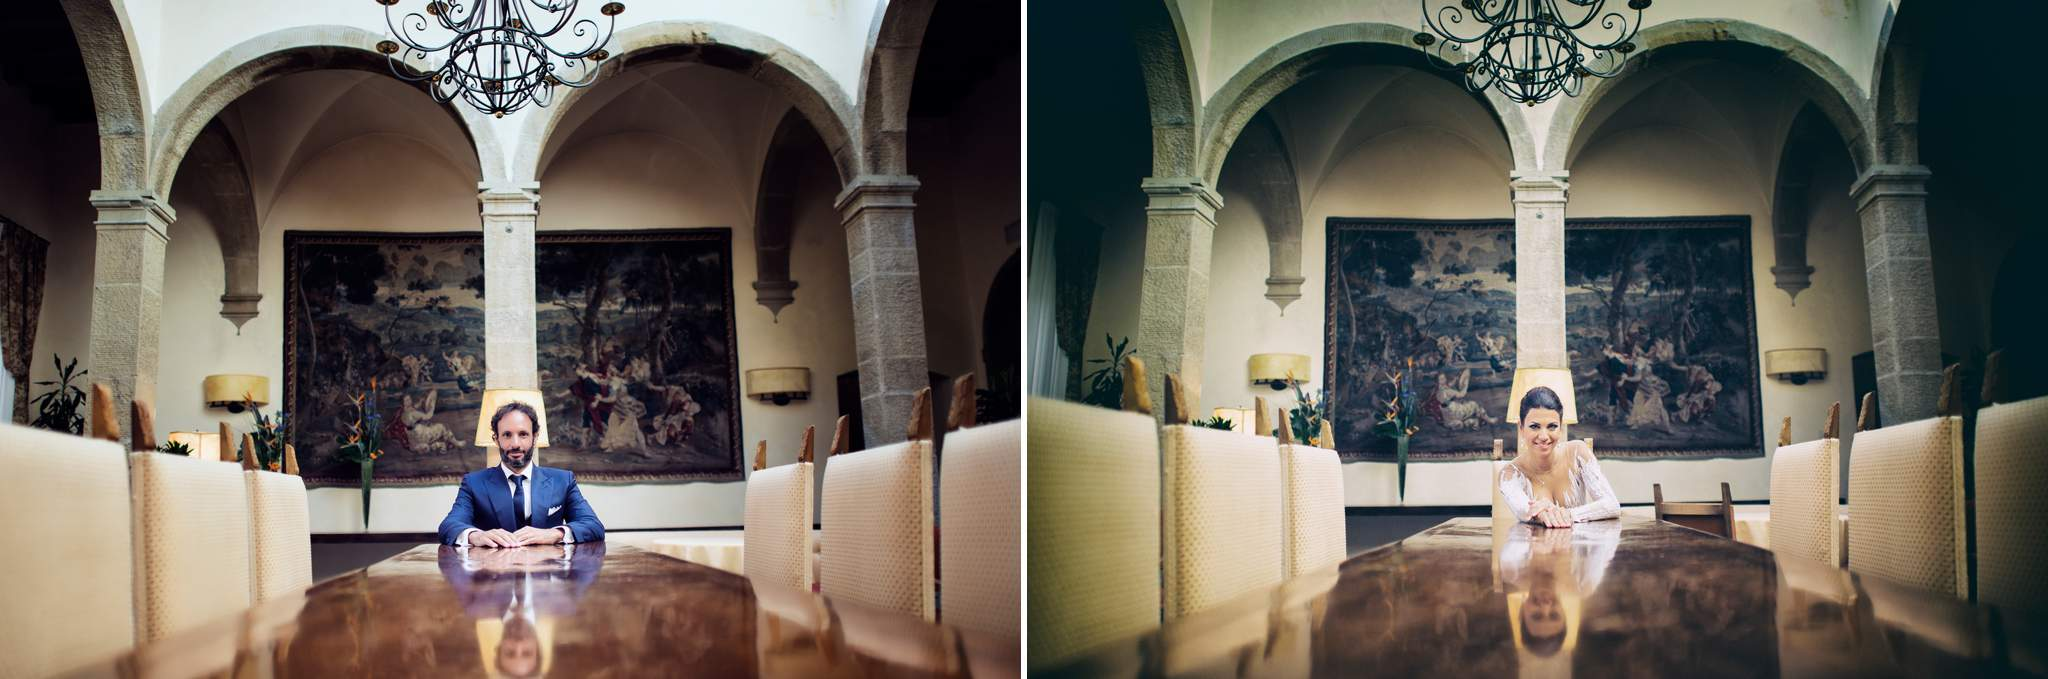 24fotografo-matrimonio-villa-san-michele-belmond